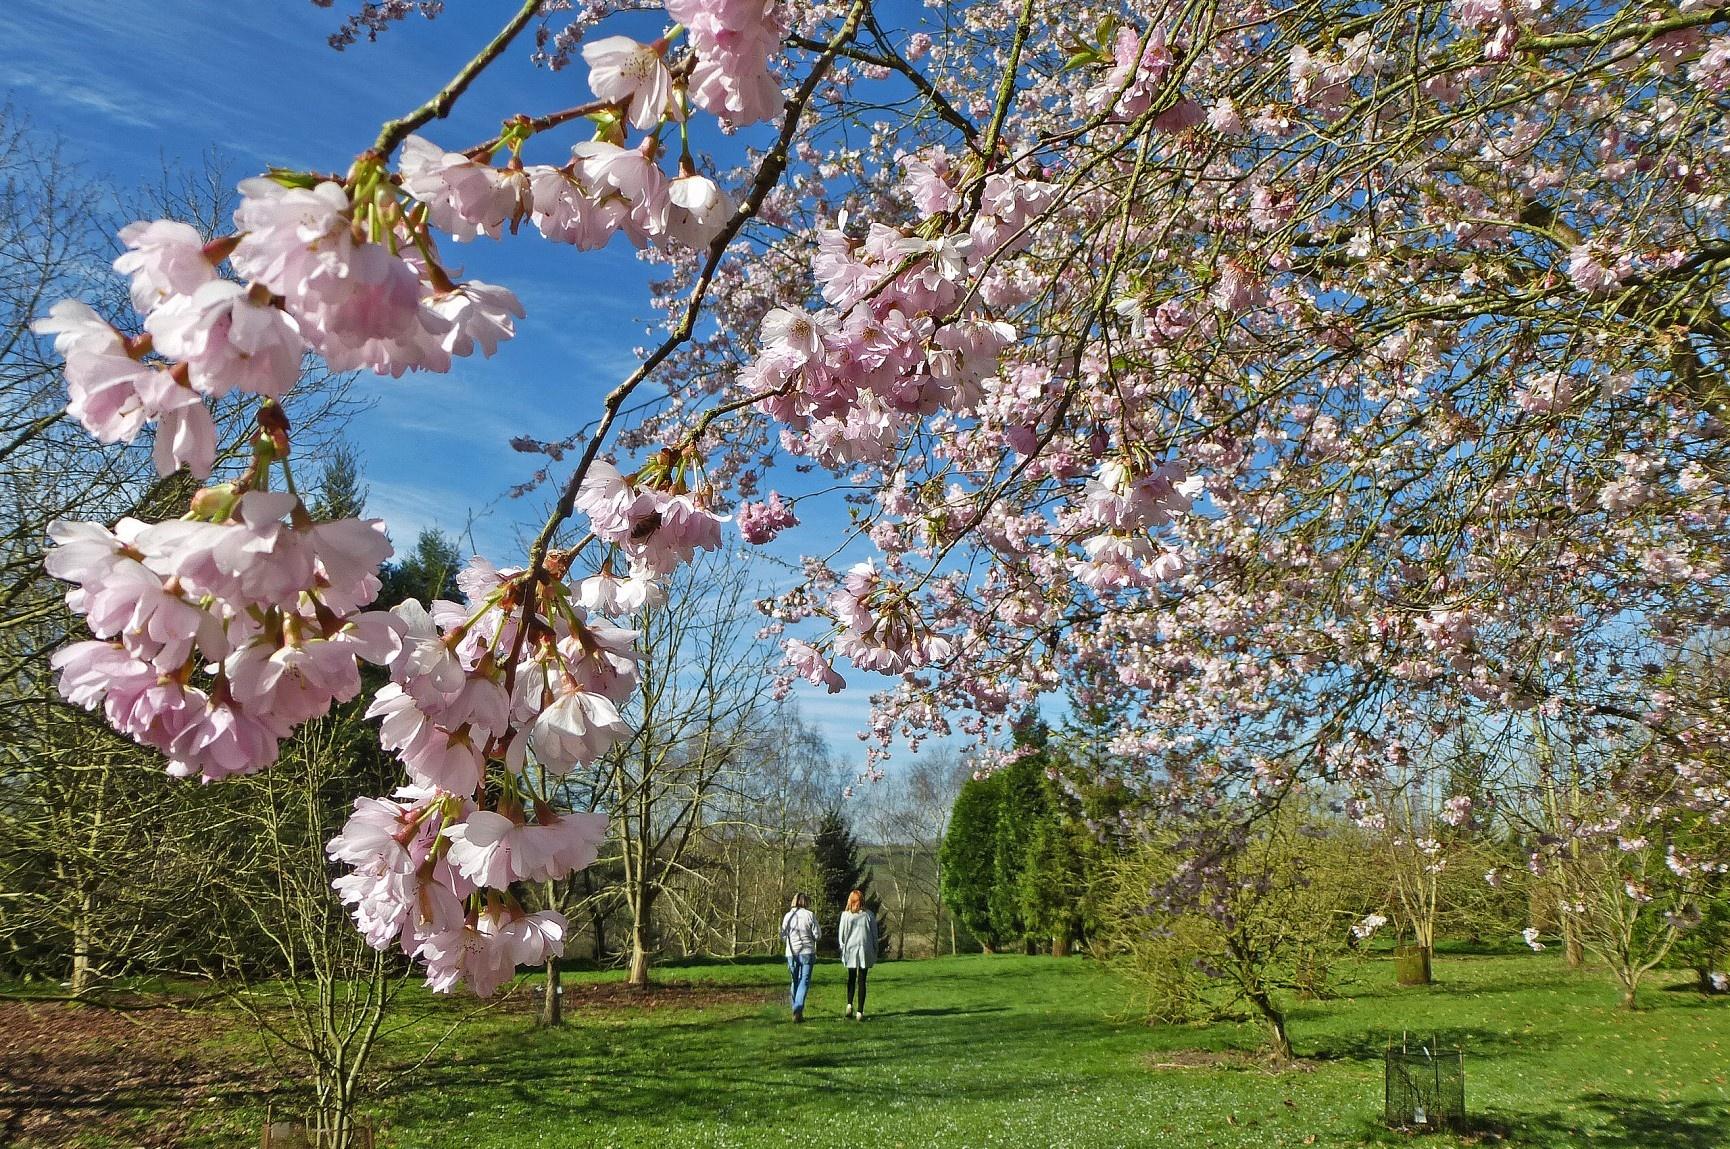 lovell-quinta-arboretum-seasonal-gallery-4